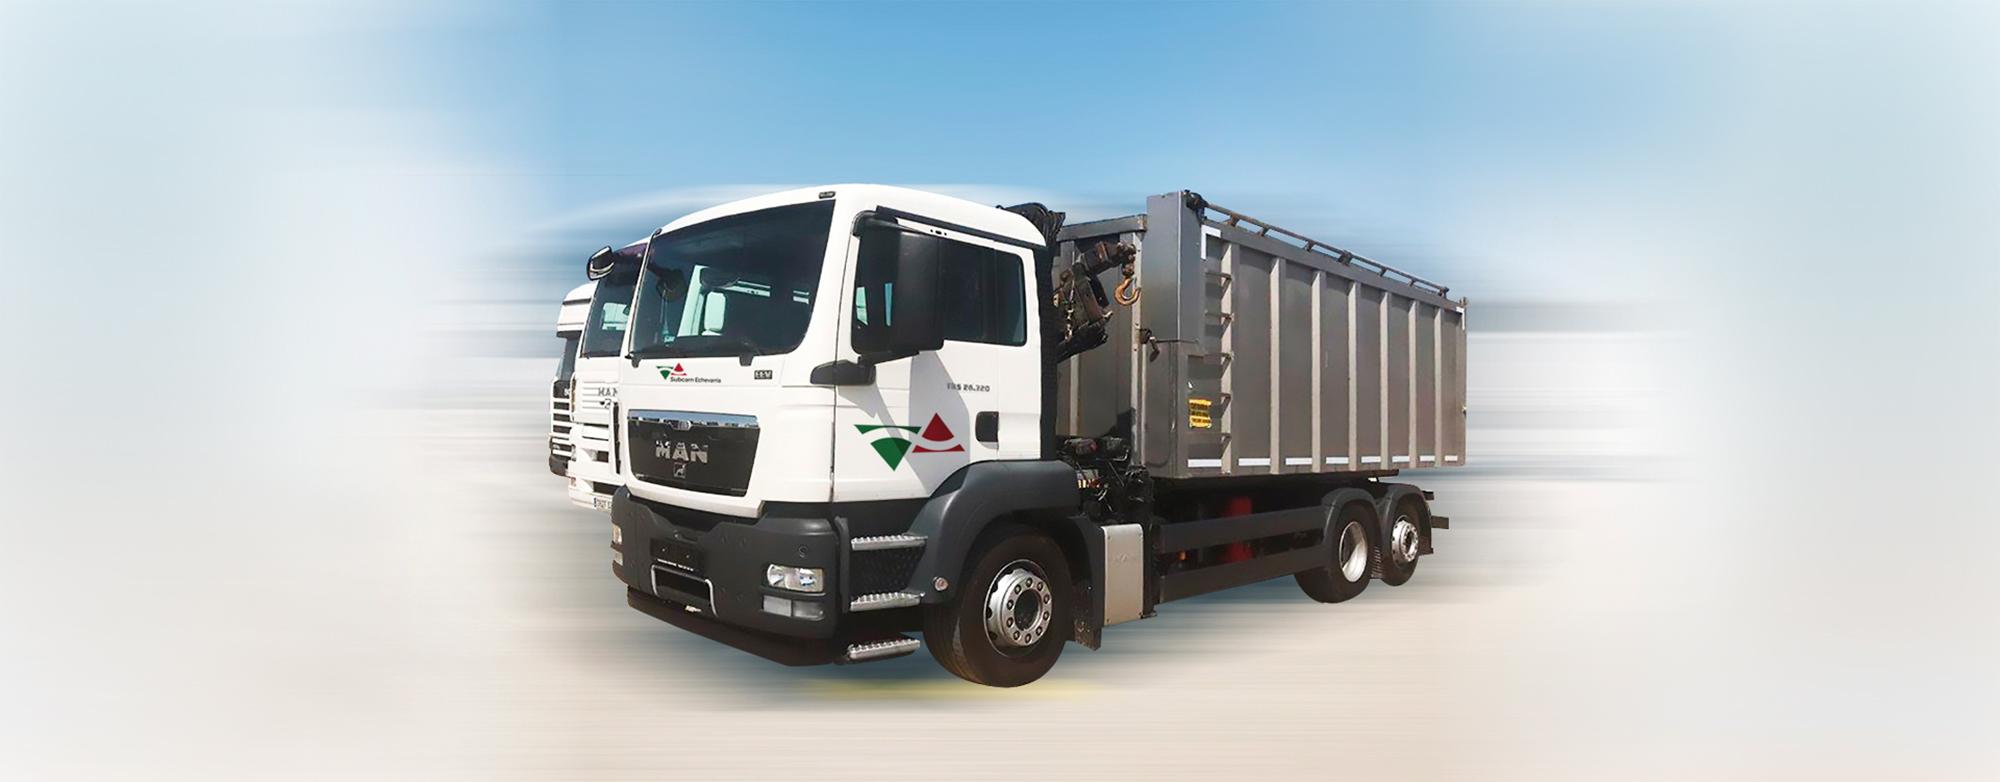 logistica subcarn camiones inox recogida producto